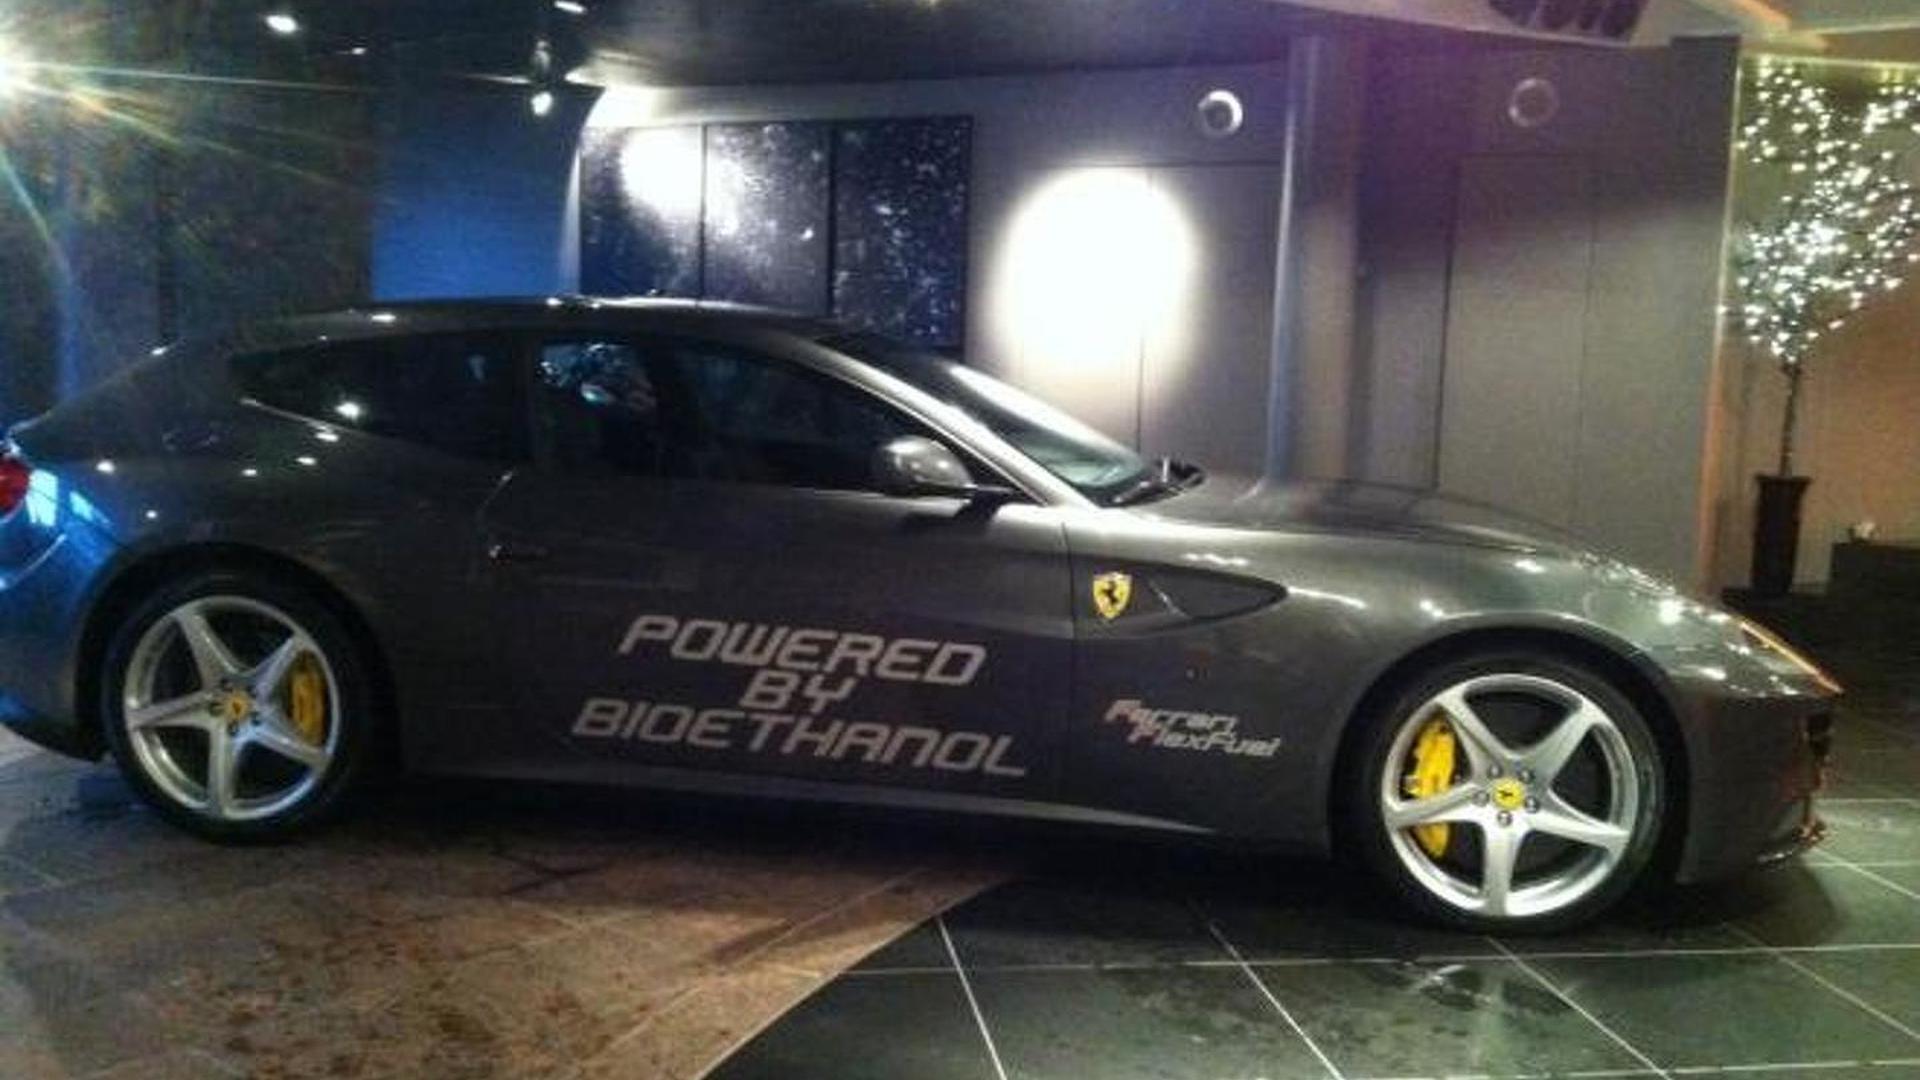 Ferrari FF with bio-ethanol E85 conversion produces 875bhp